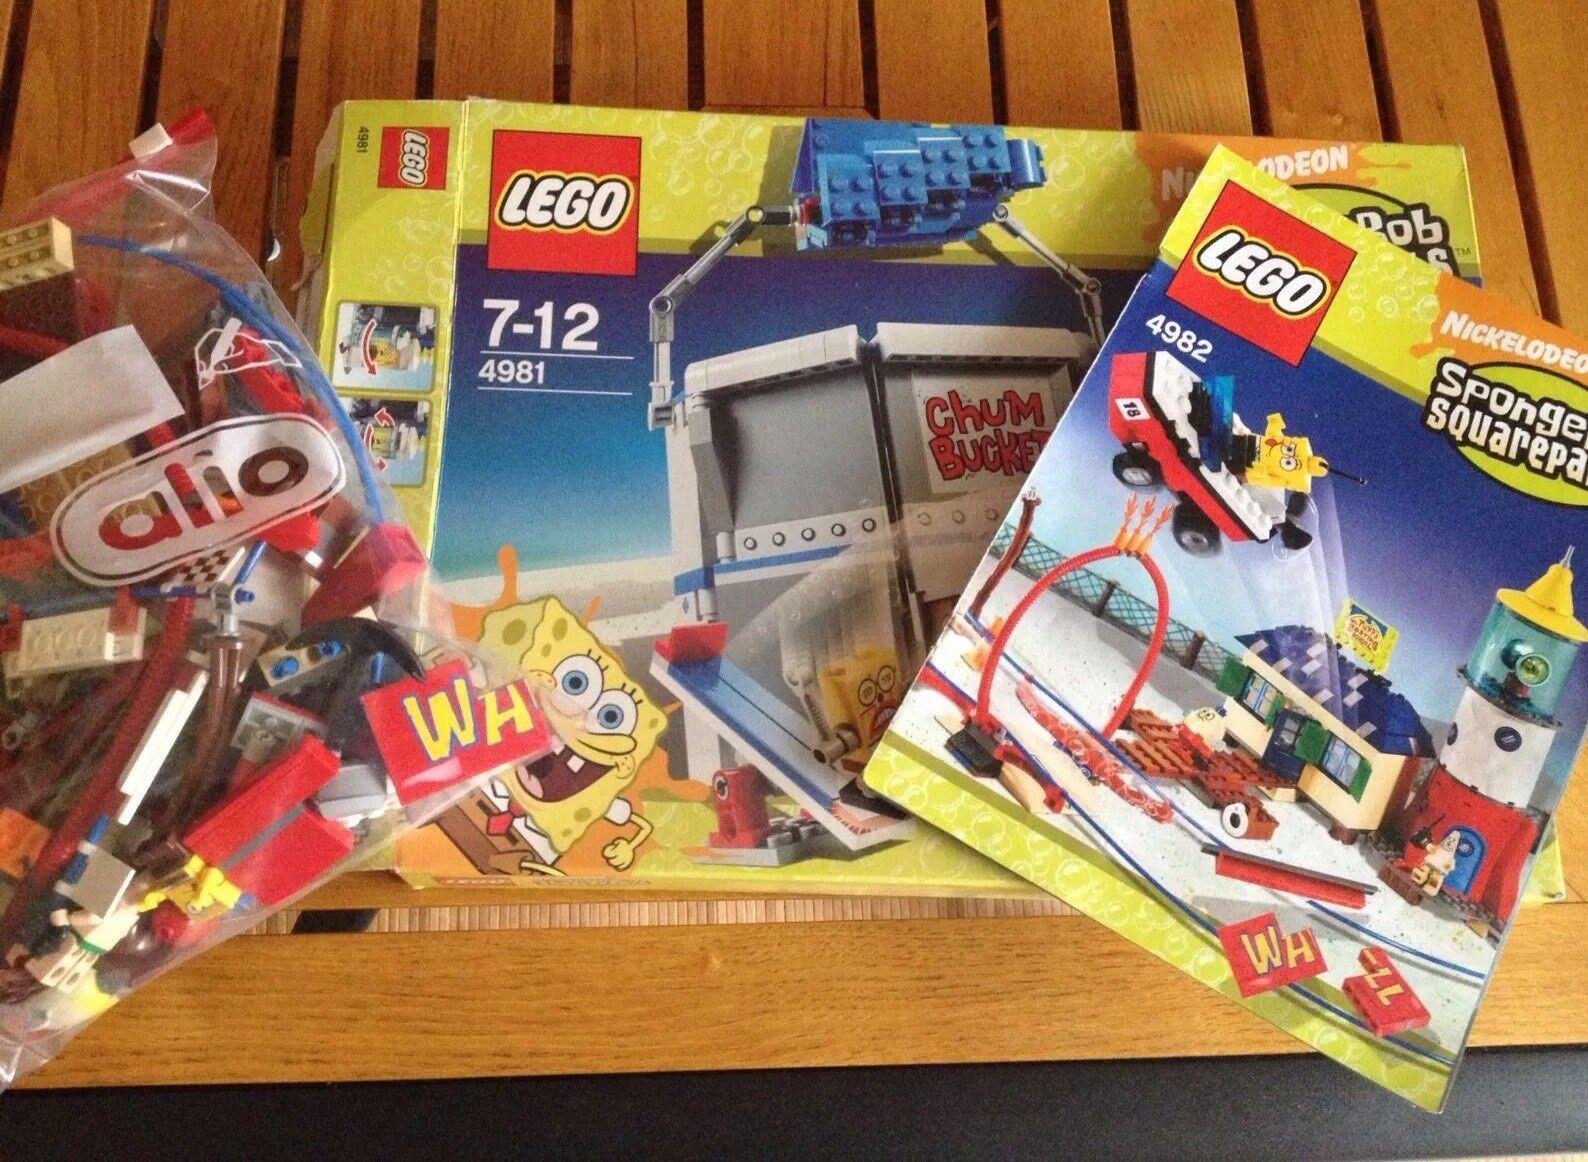 Spongebob Lego Set Chum Bucket Und Mrs.Puffs Fahrschule